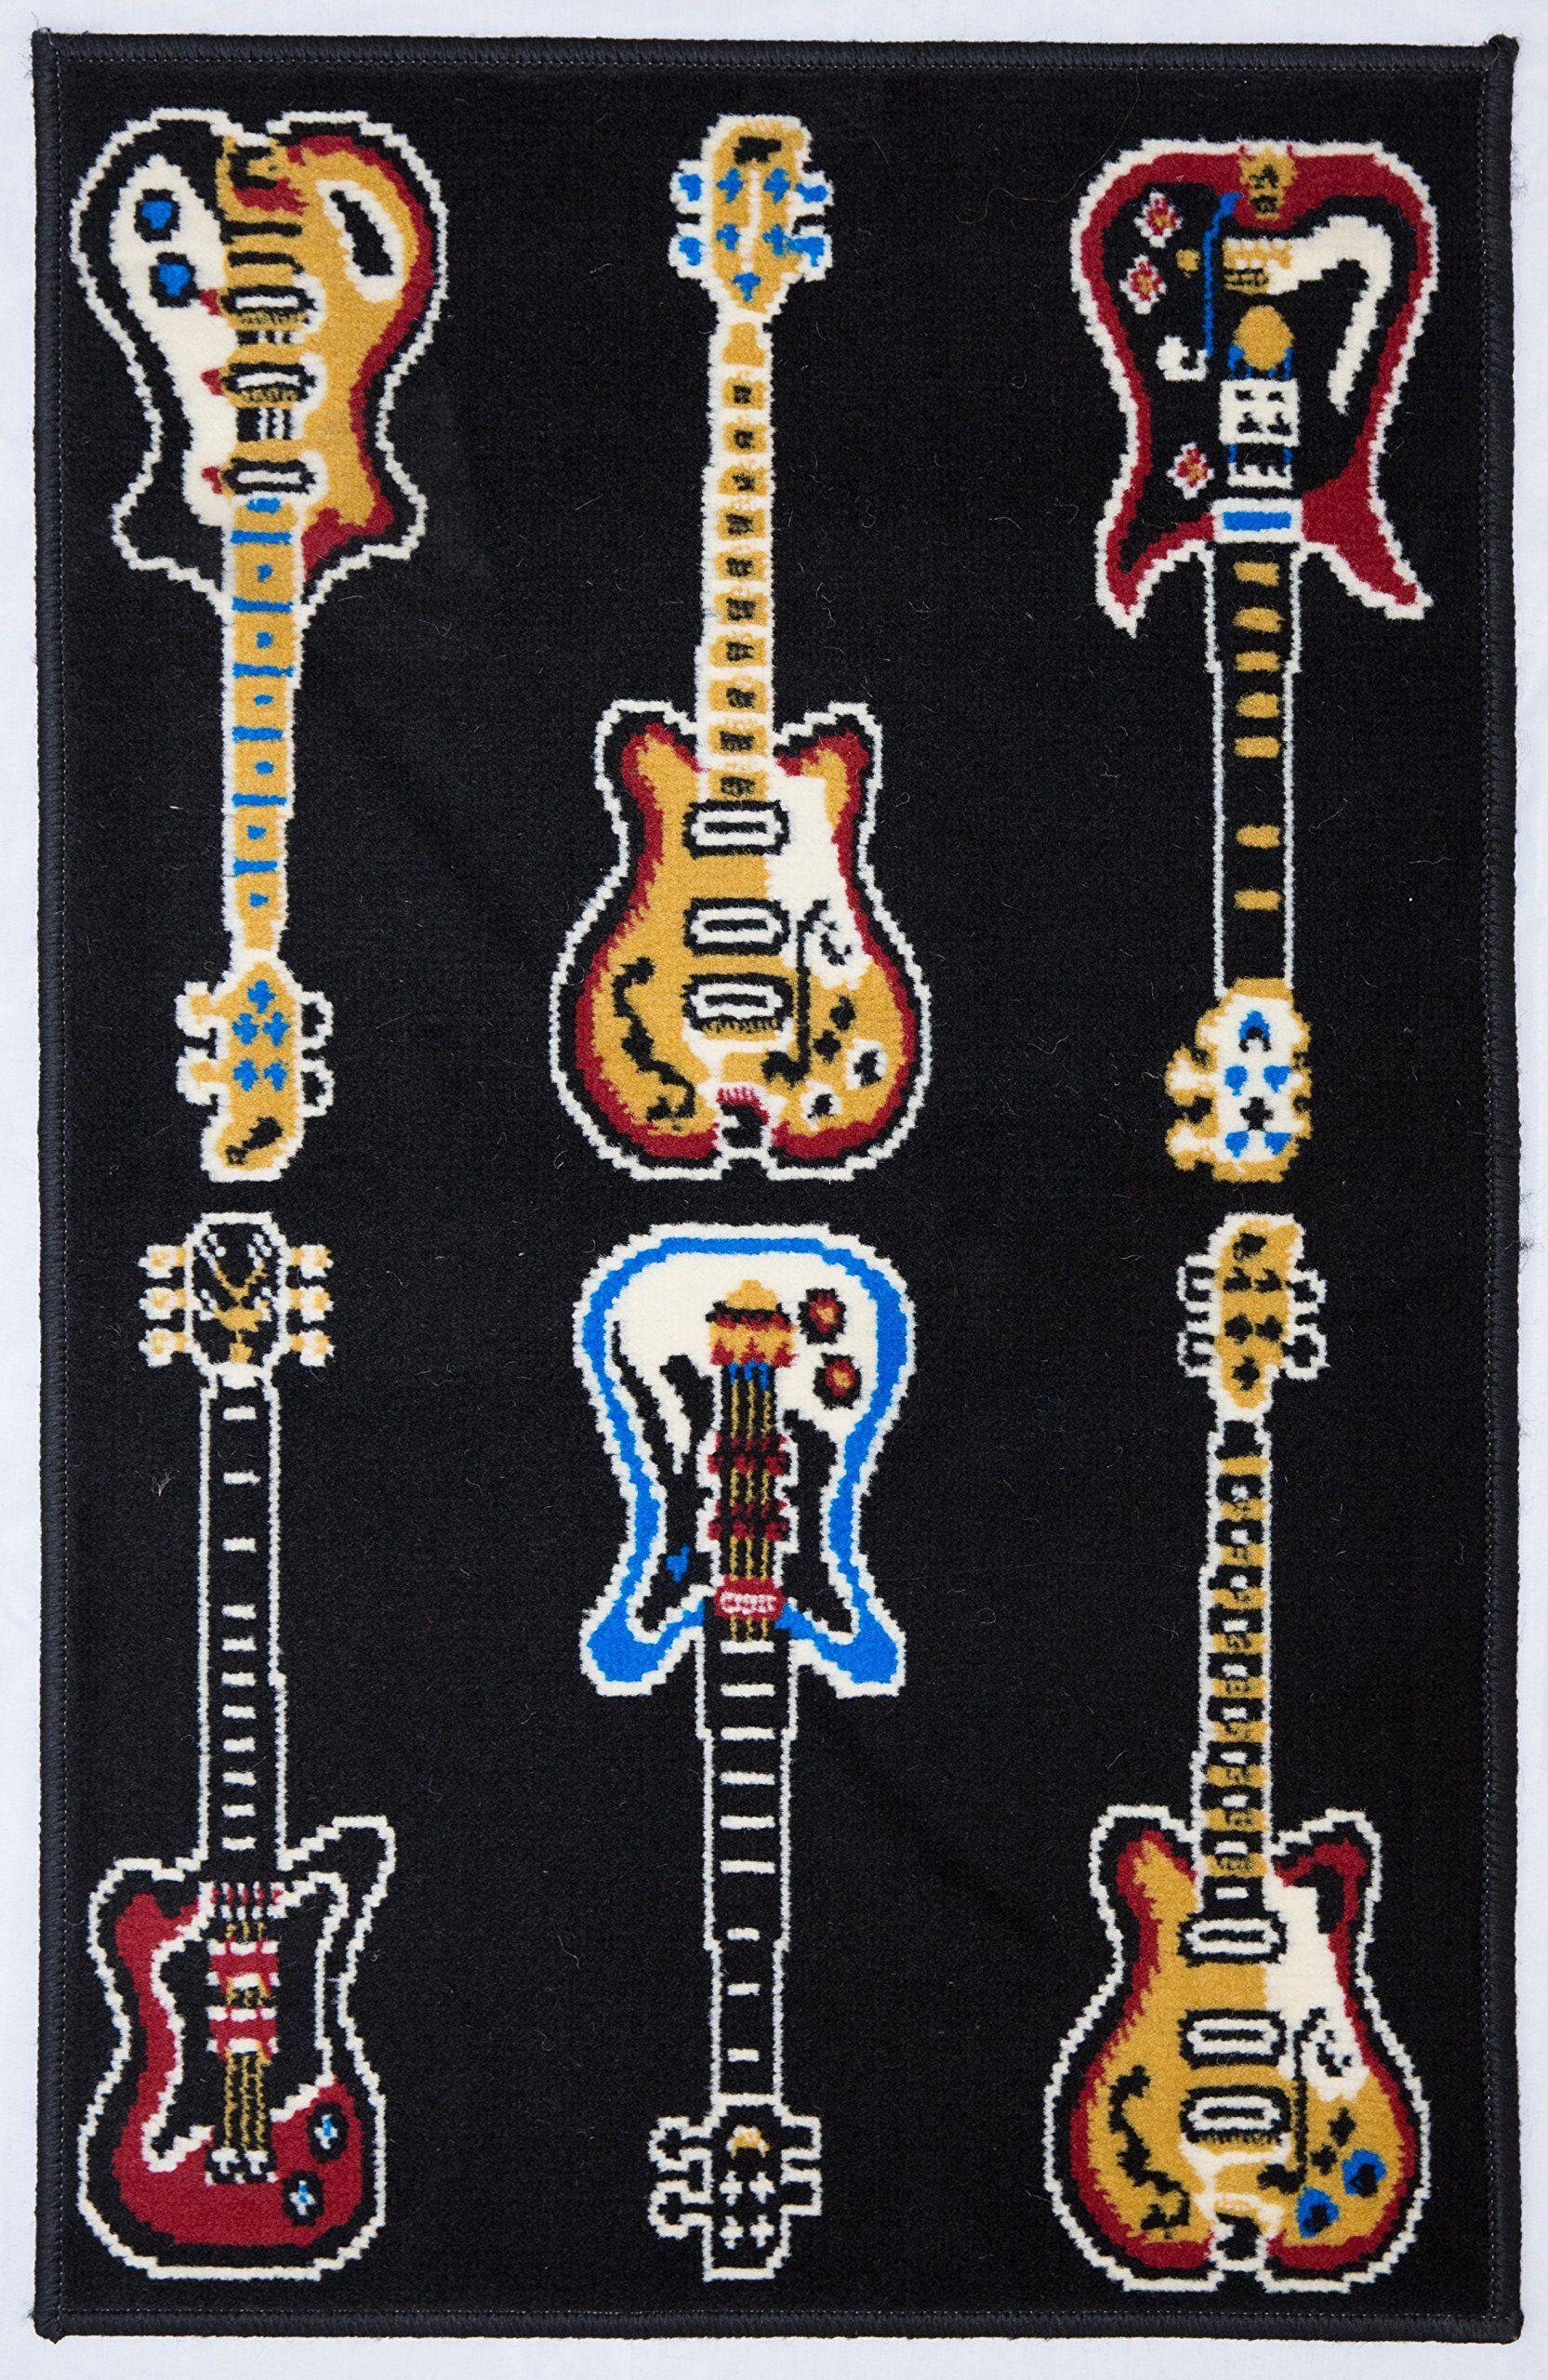 Musical Theme Guitar Contemporary